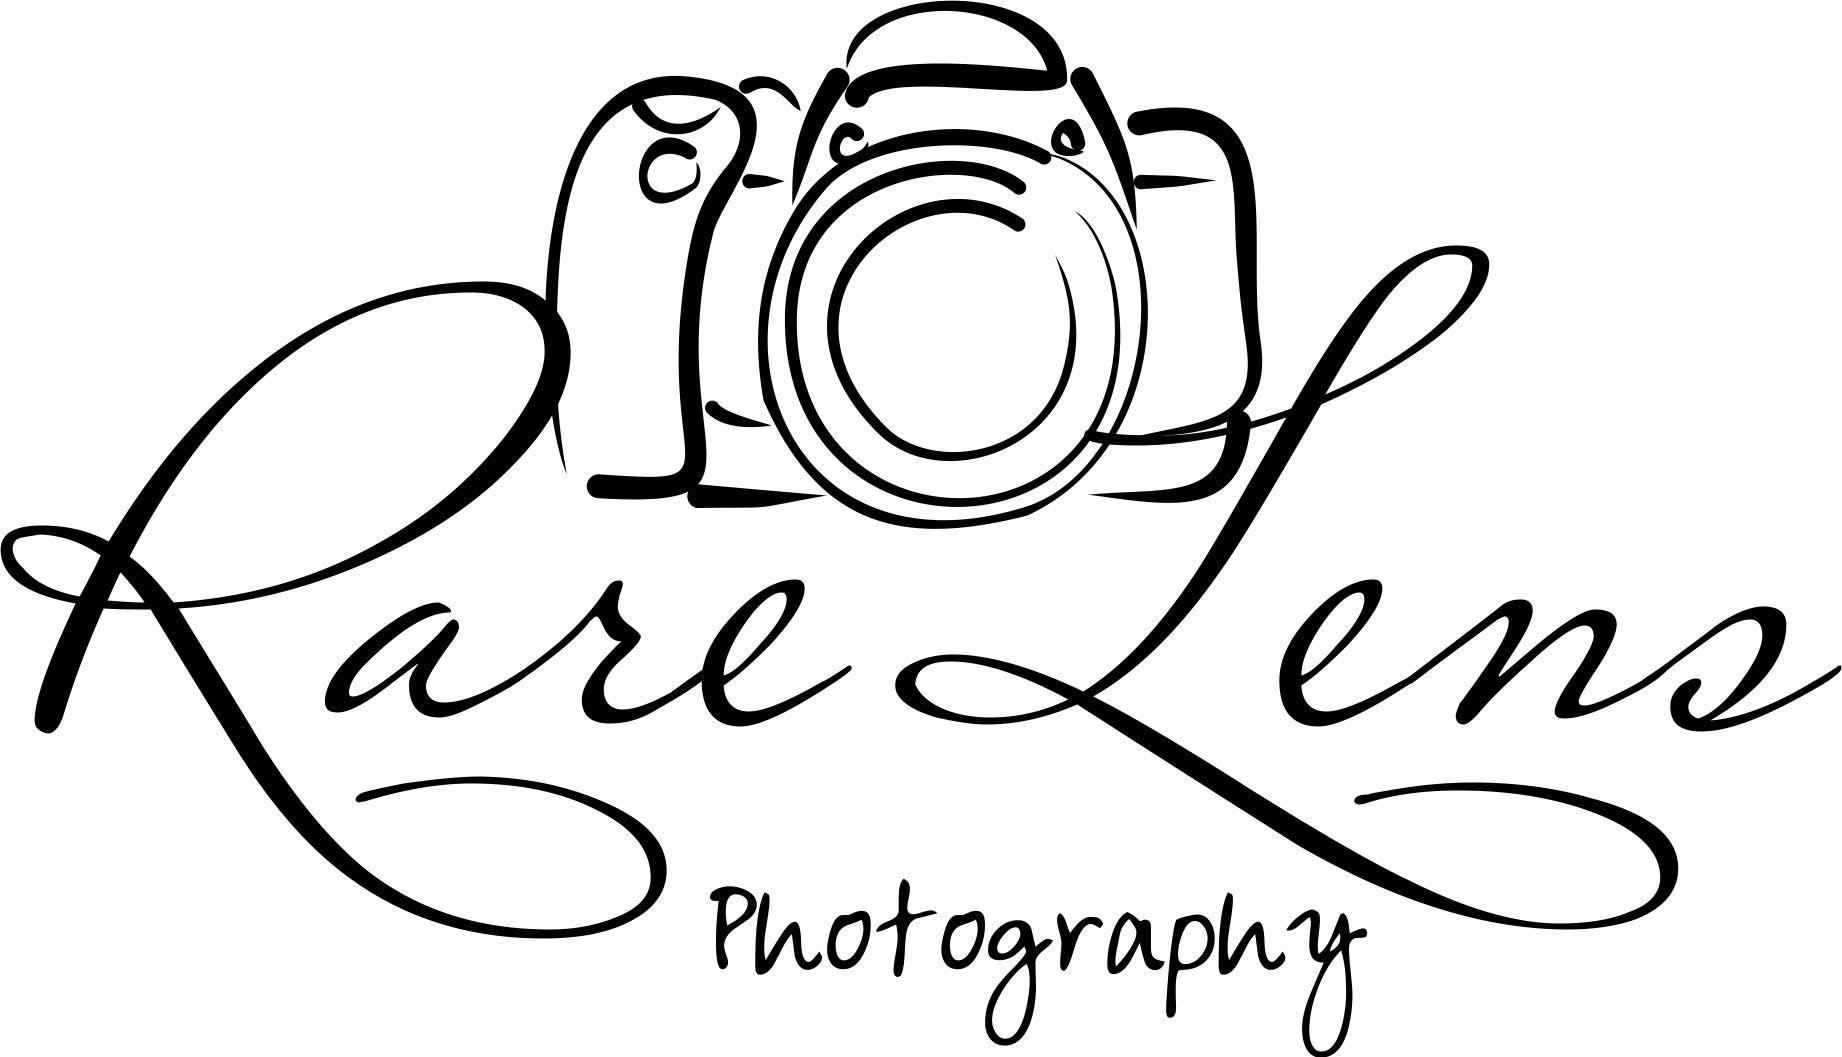 Rare Lens Photography